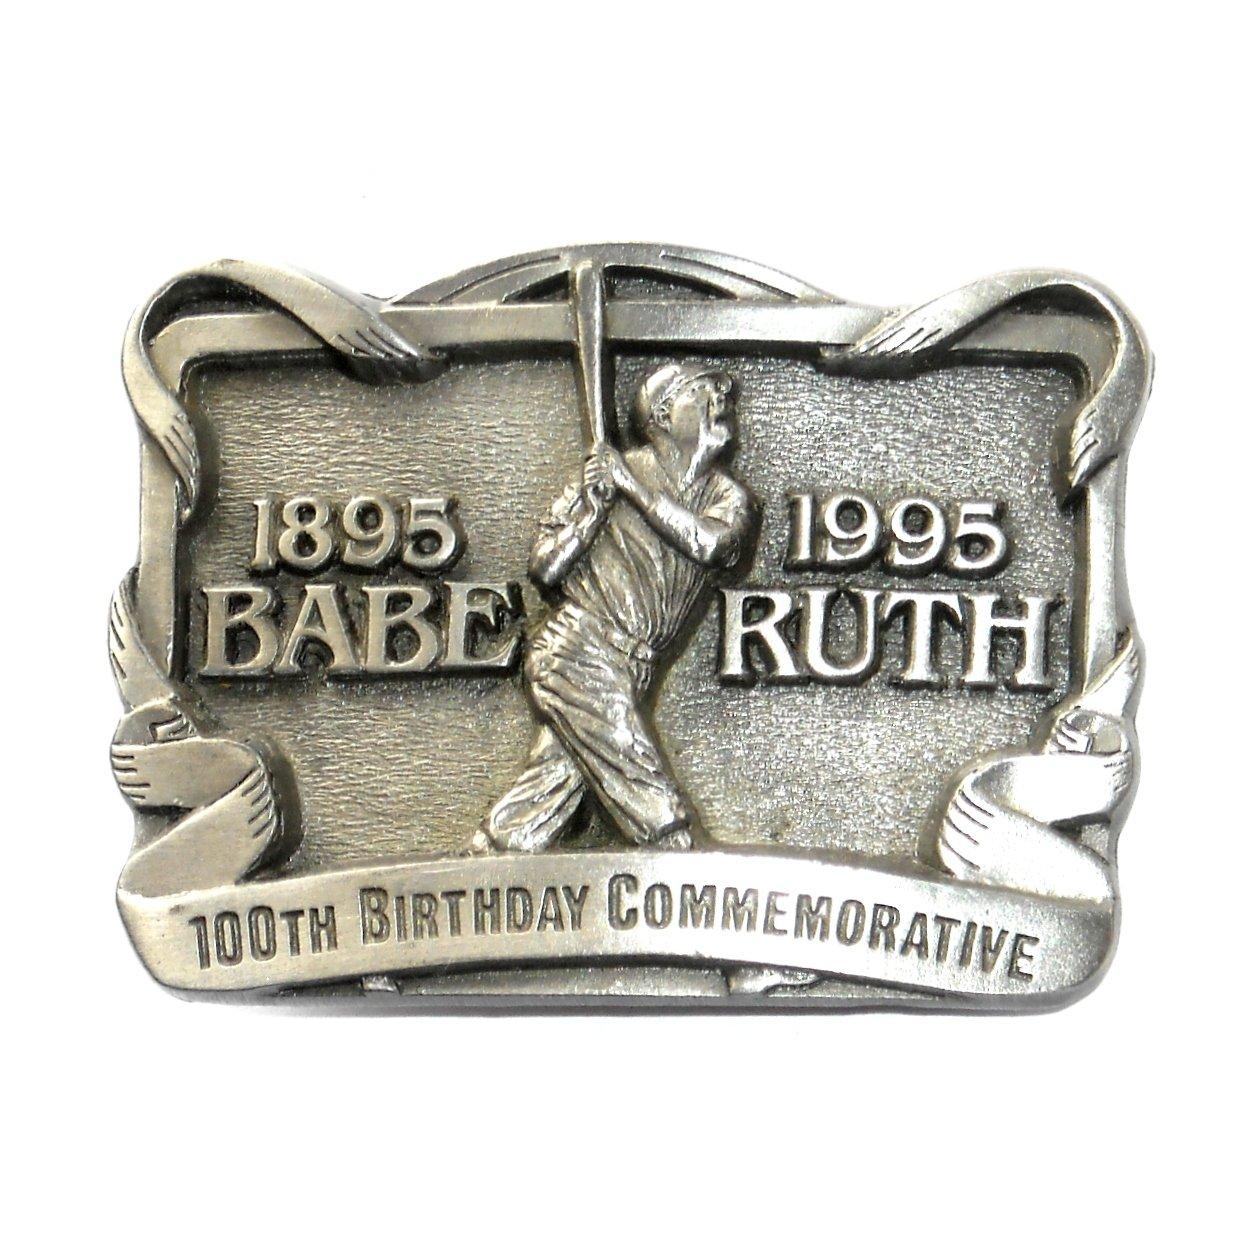 Babe ruth highlights-2700